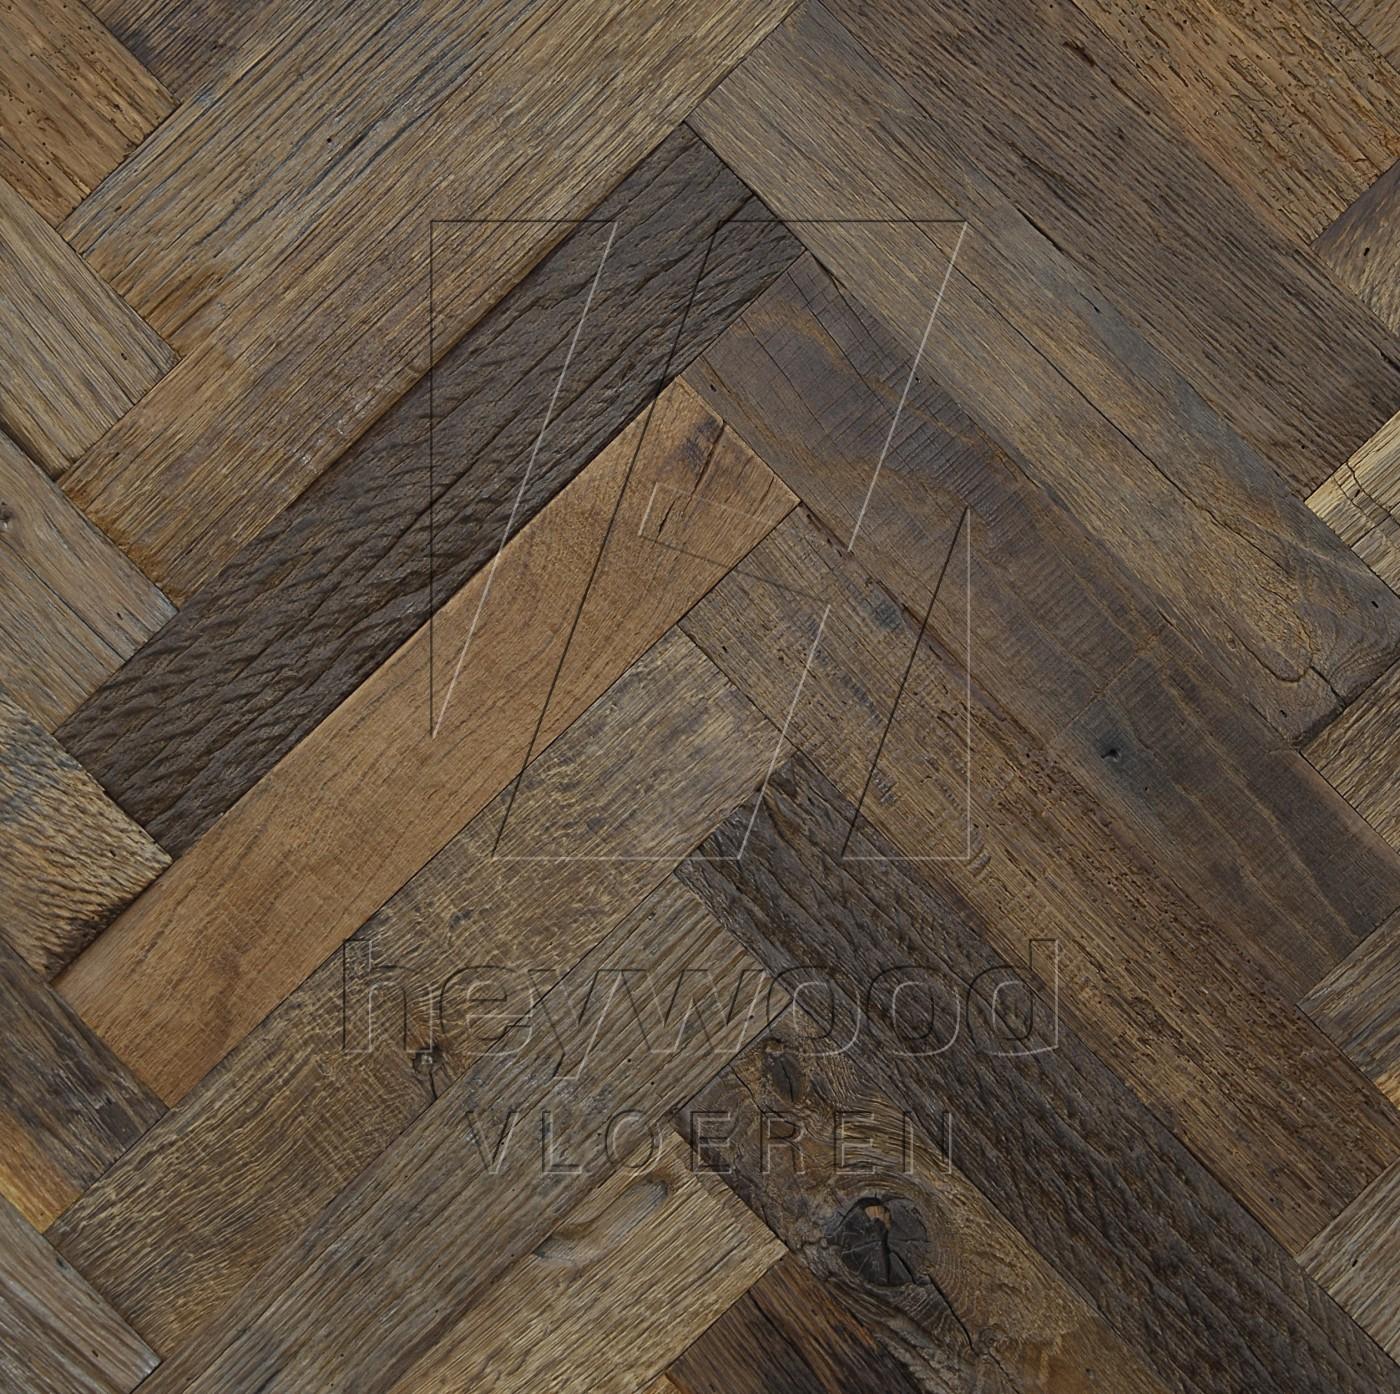 Cotswolds Herringbone (200 years old Reclaimed Oak, Outside) in Pattern & Panels (Outsides / Insides) of Old Reclaimed Wood